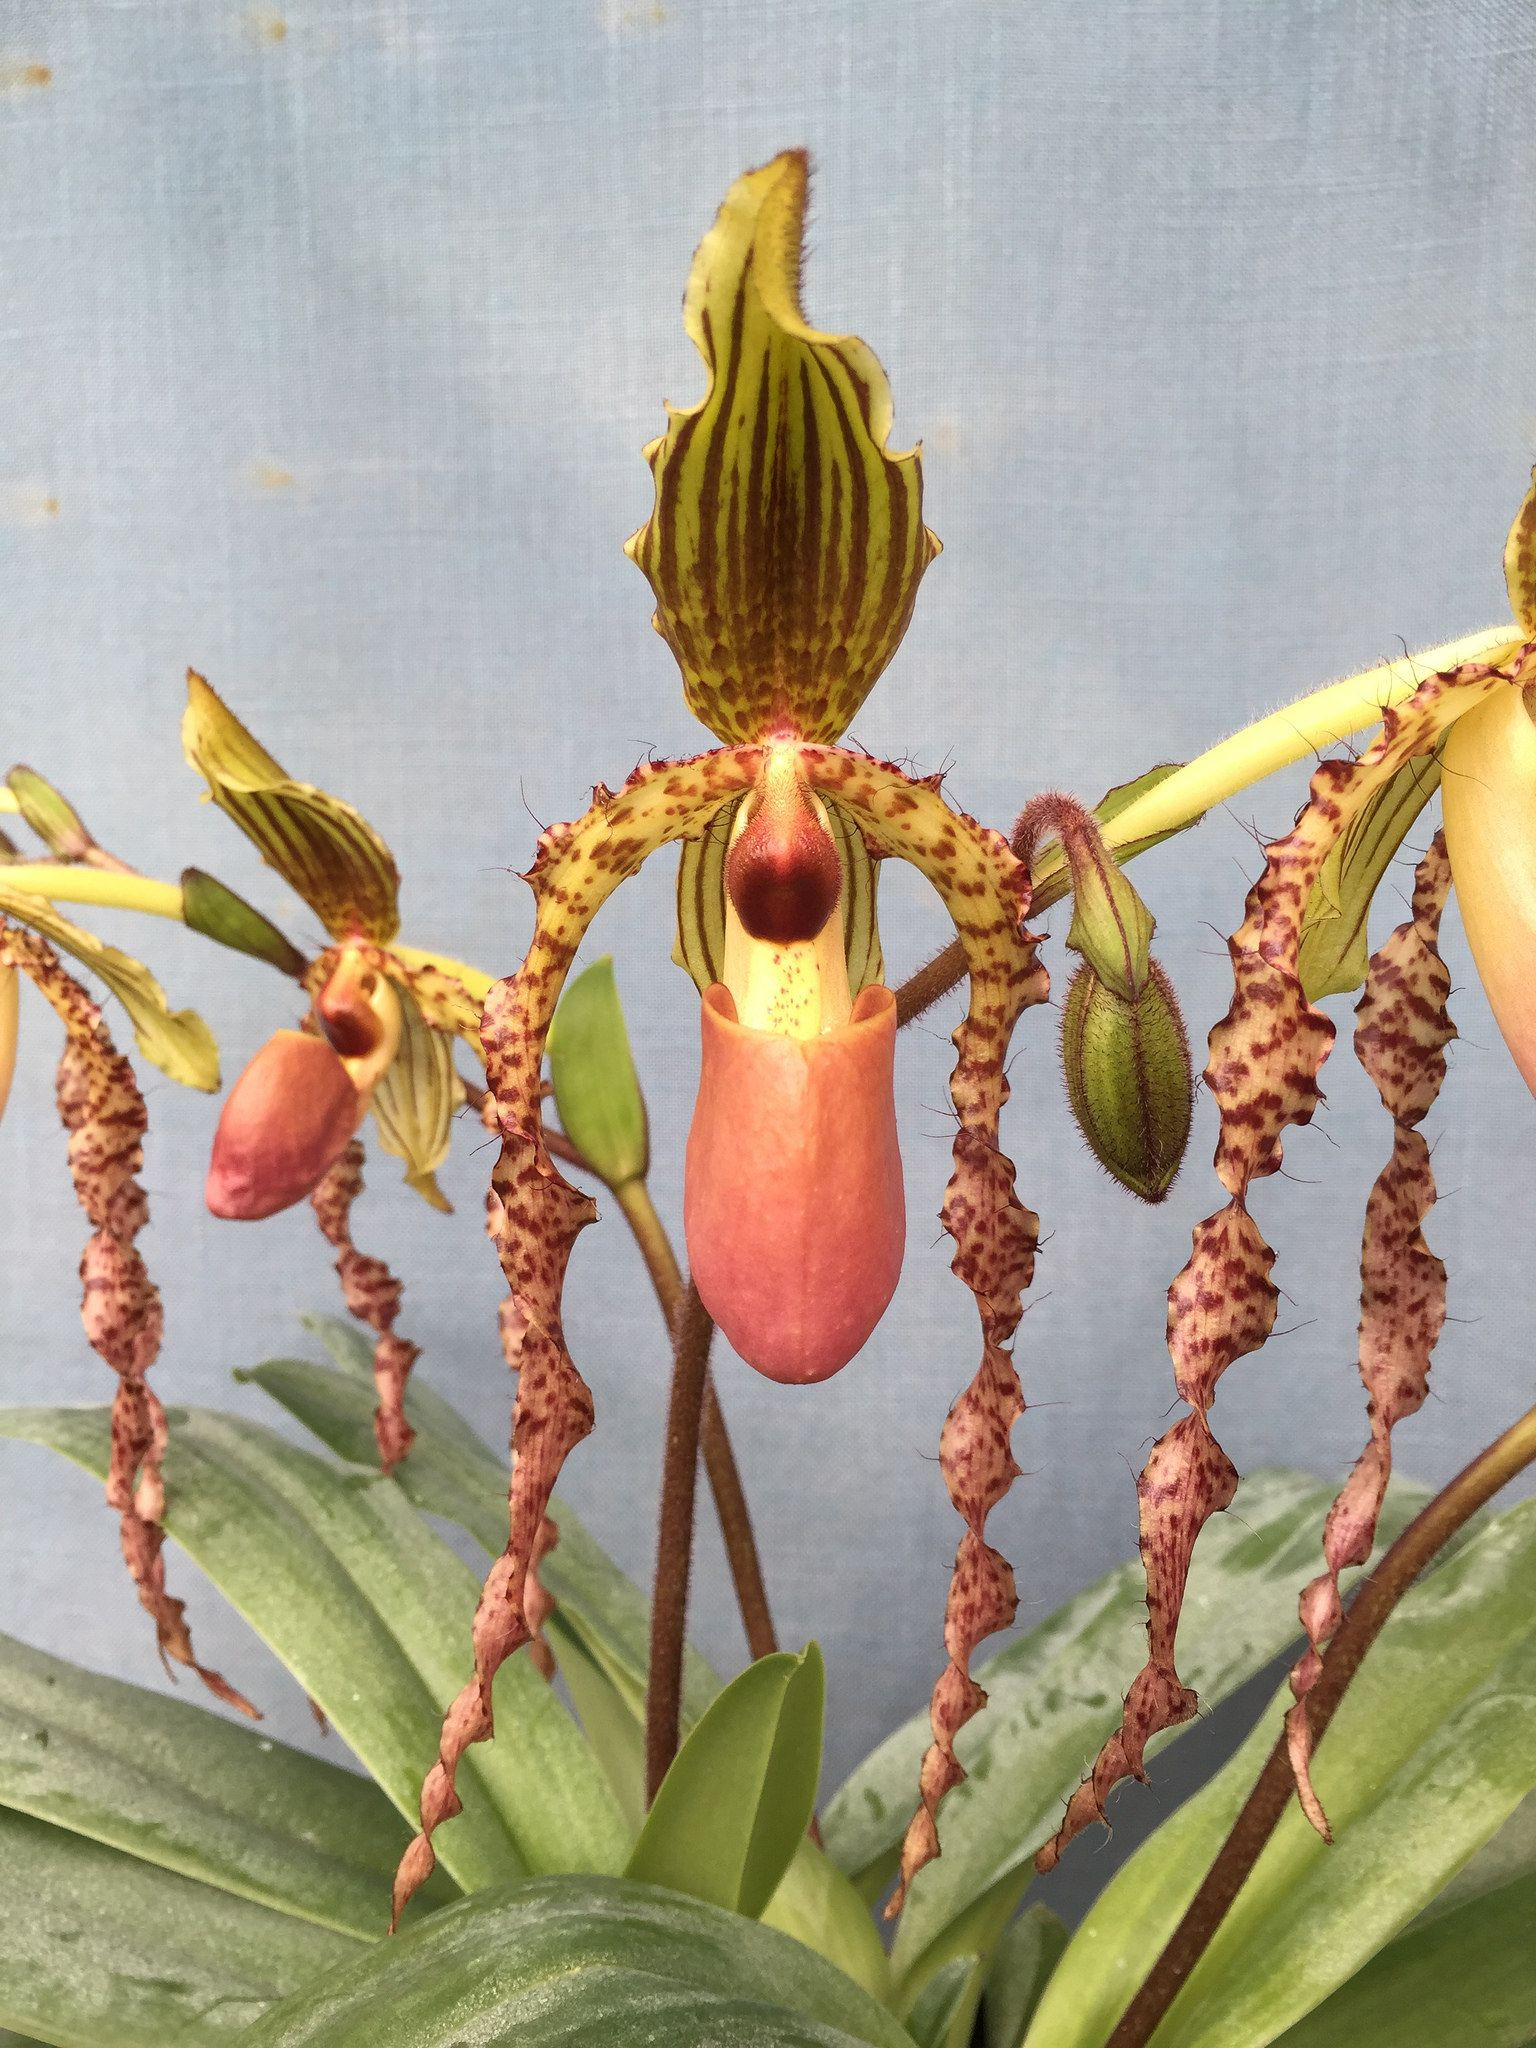 Slipper orchid Paphiopedilum Landmark Cry Baby Paphiopedilum glaucophyllum x Paphiopedilum sanderianum Flickr Sharing